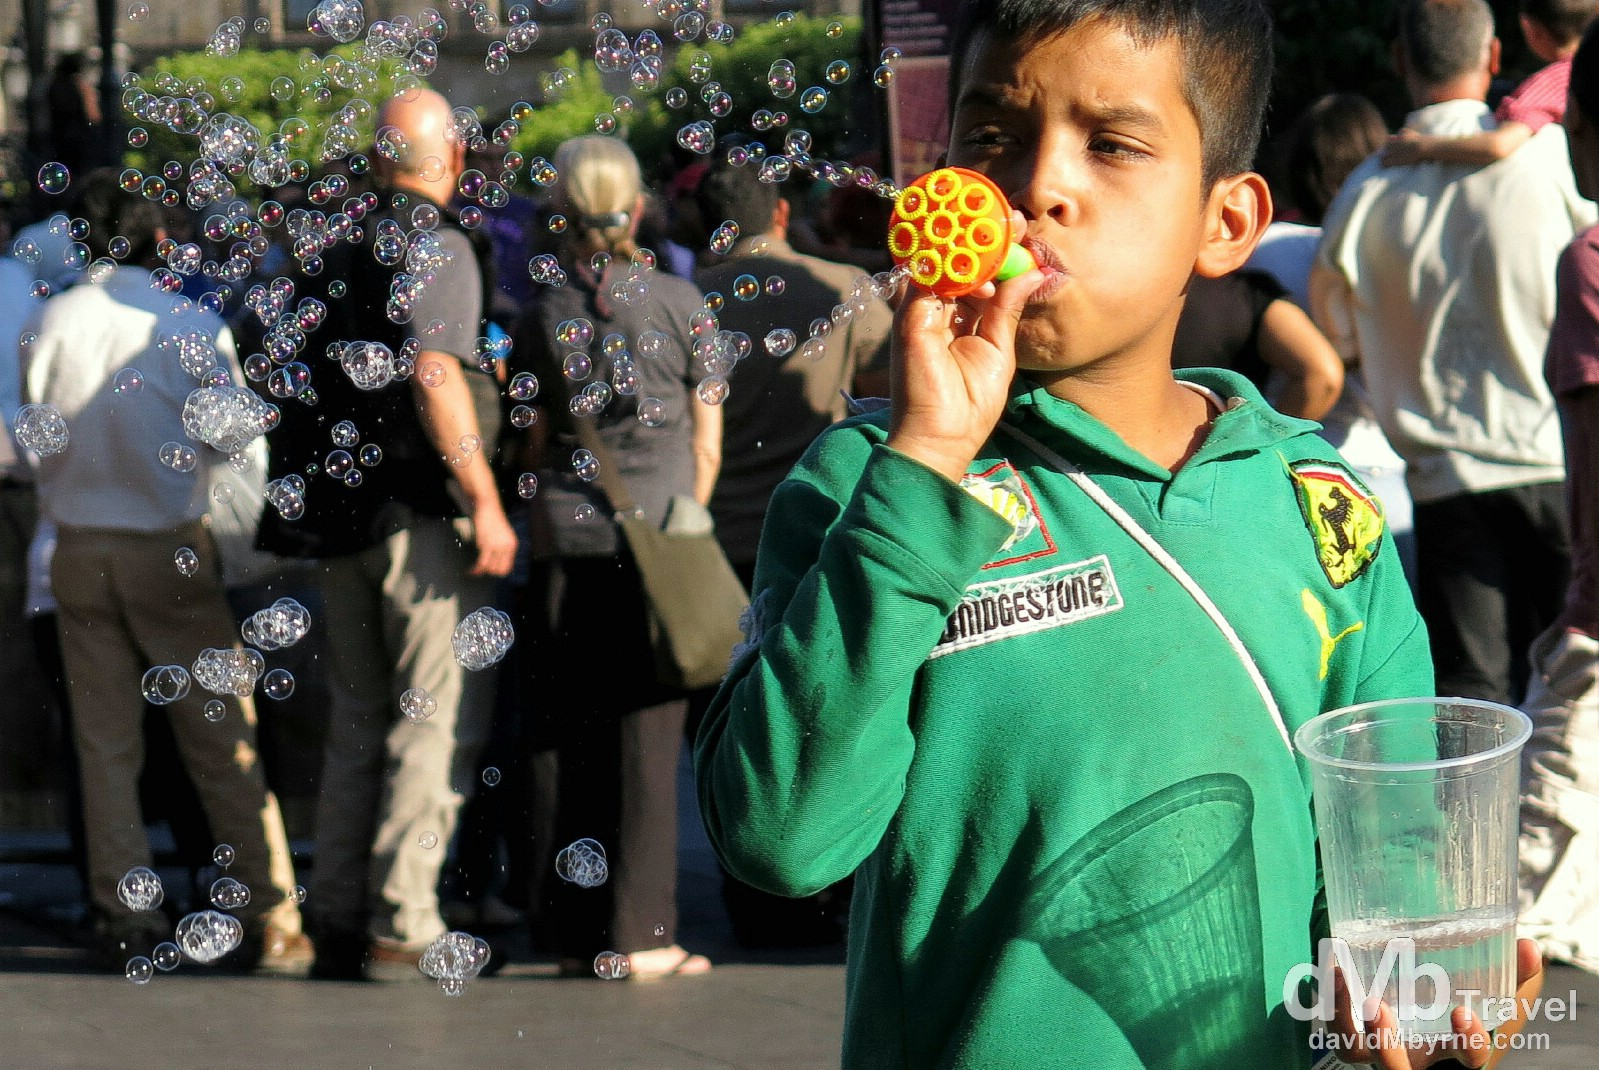 Blowing bubbles in Plaza de Armas, Guadalajara, Mexico. April 21st 2013.